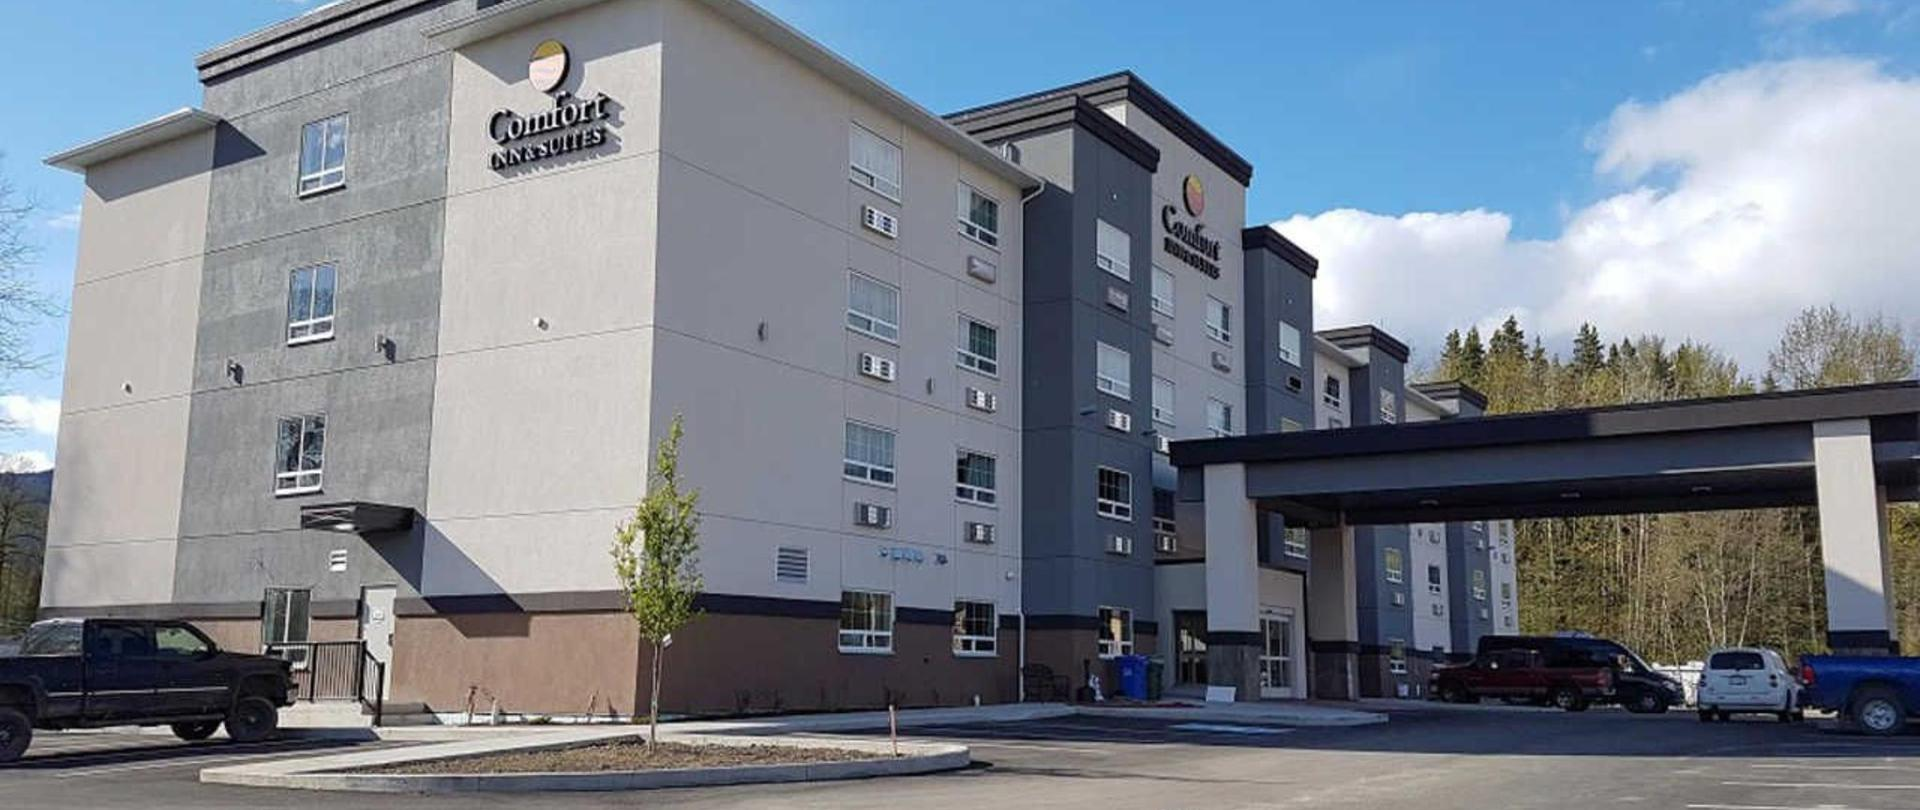 comfort-inn-suites-terrace-1.jpg